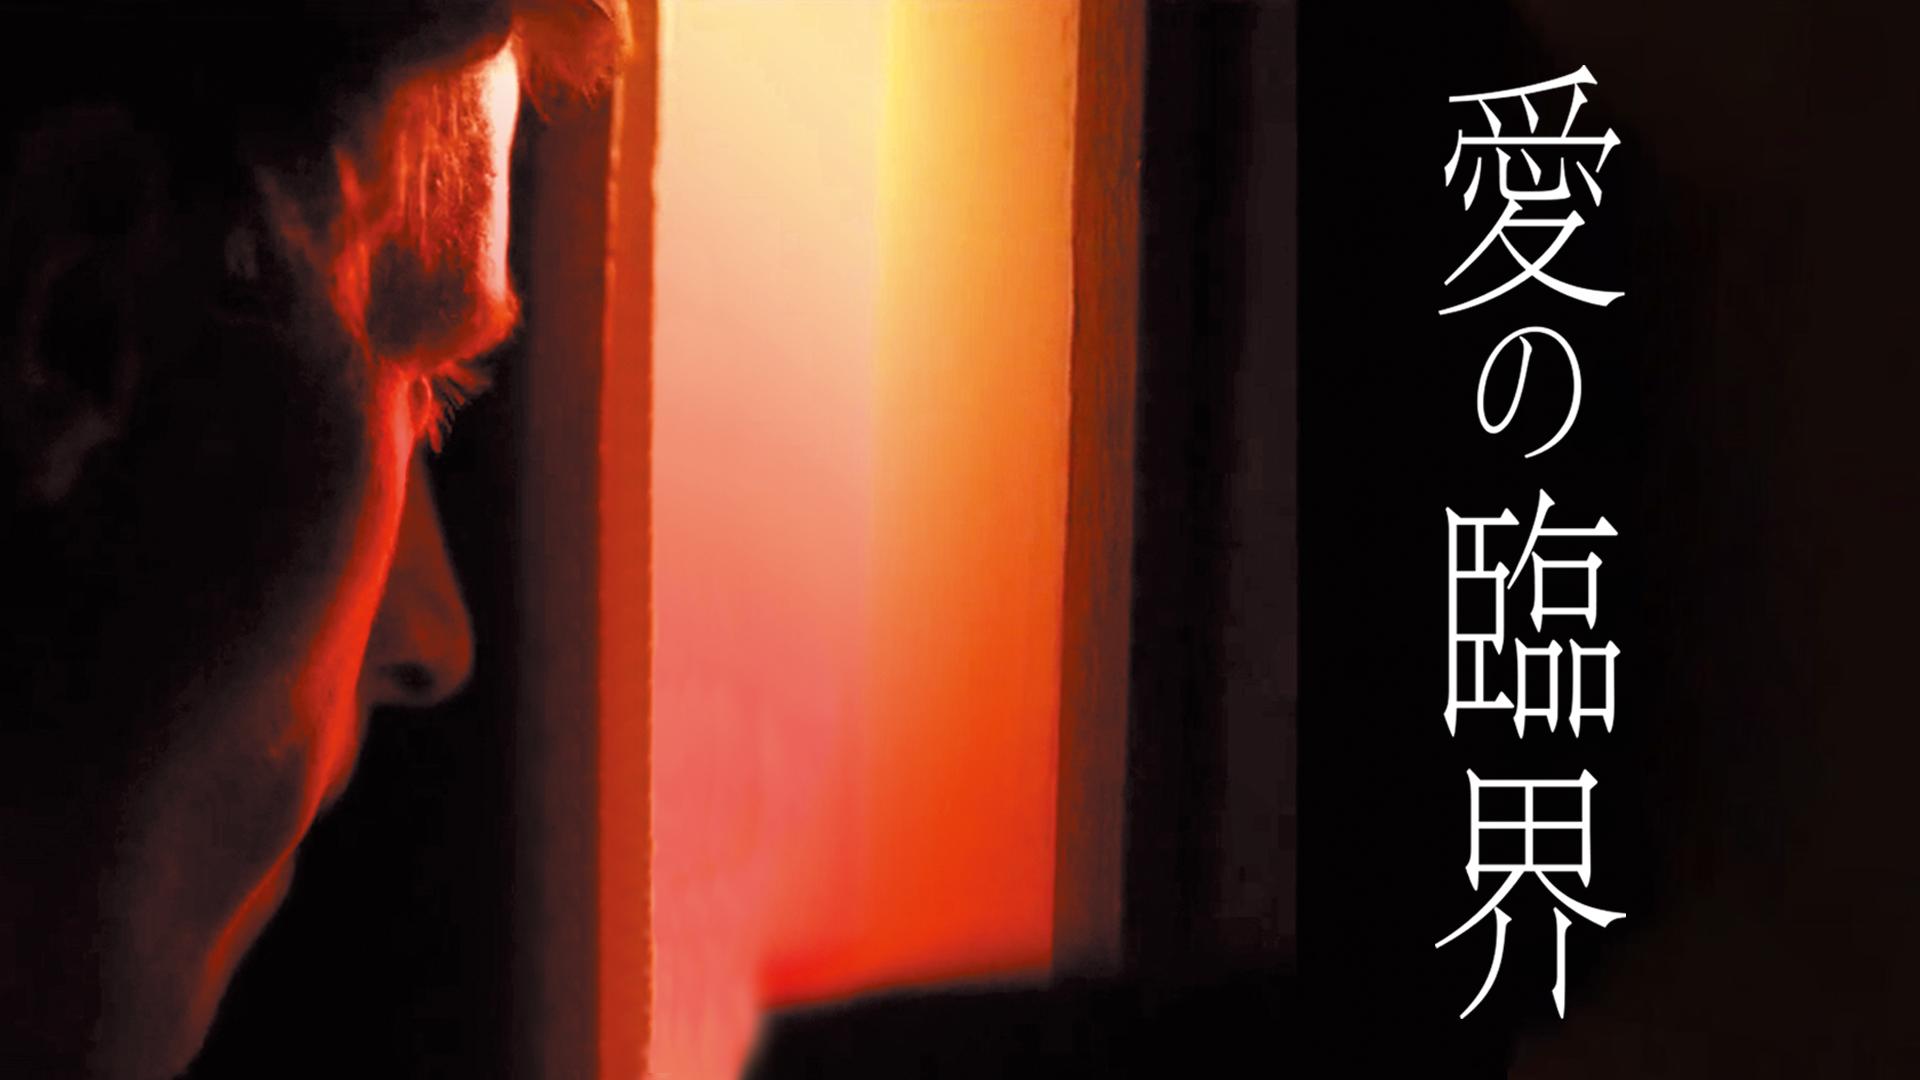 愛の臨界 (字幕版)